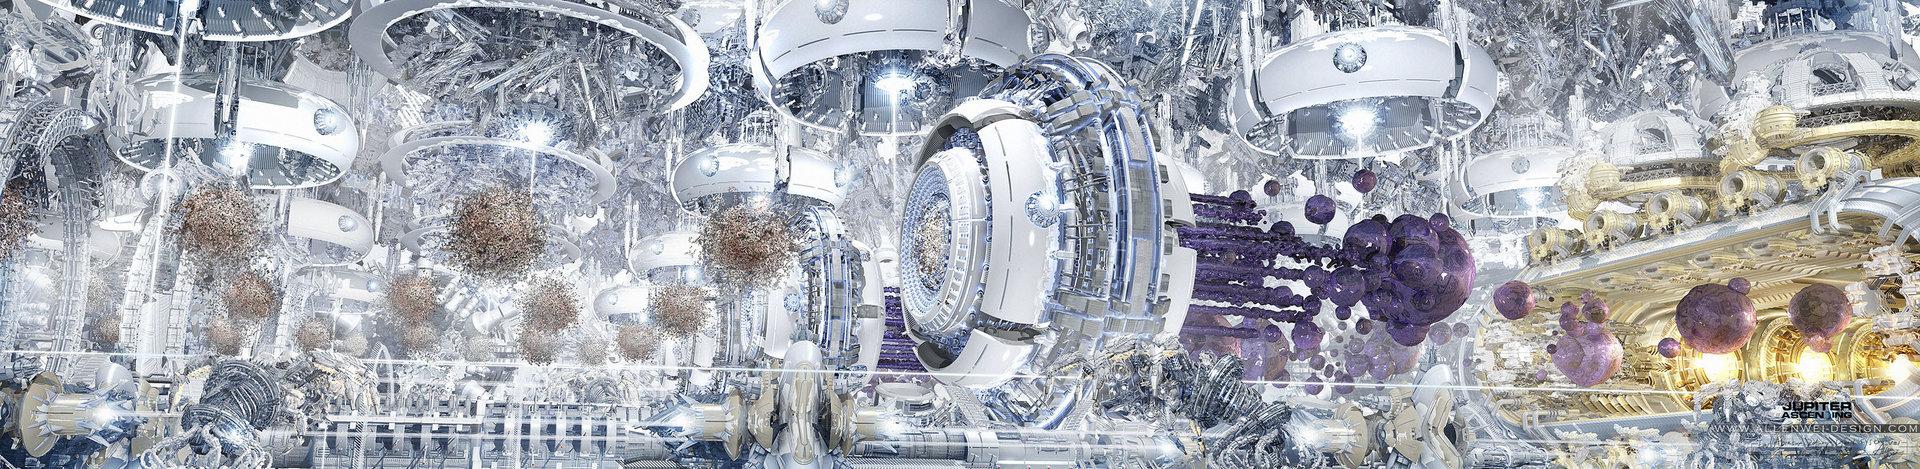 Allen wei env abrasax refinery liquid system v01